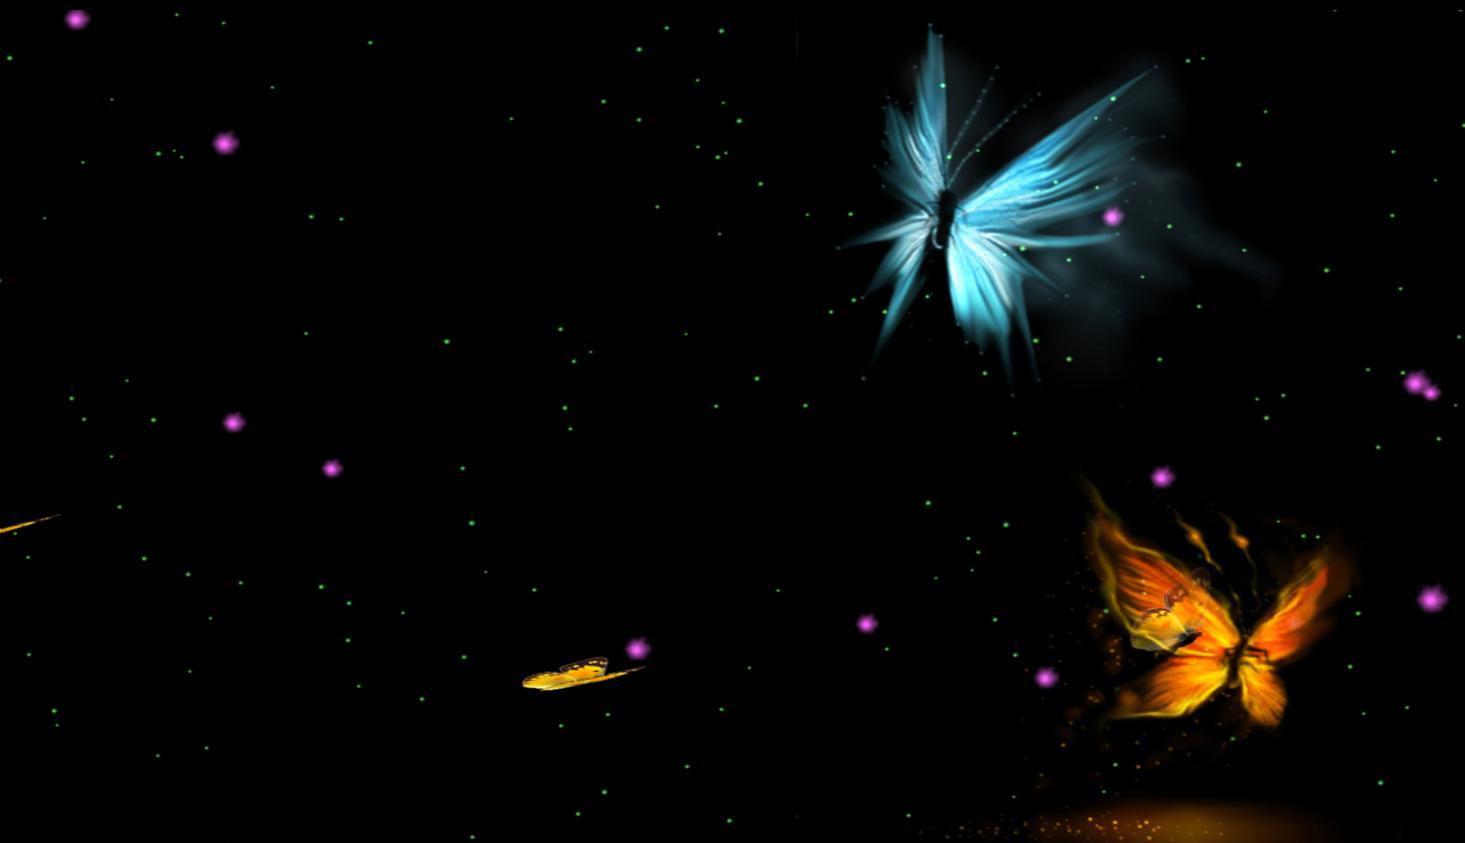 wallpaper download screensaver version fantastic butterfly screensaver 1465x843